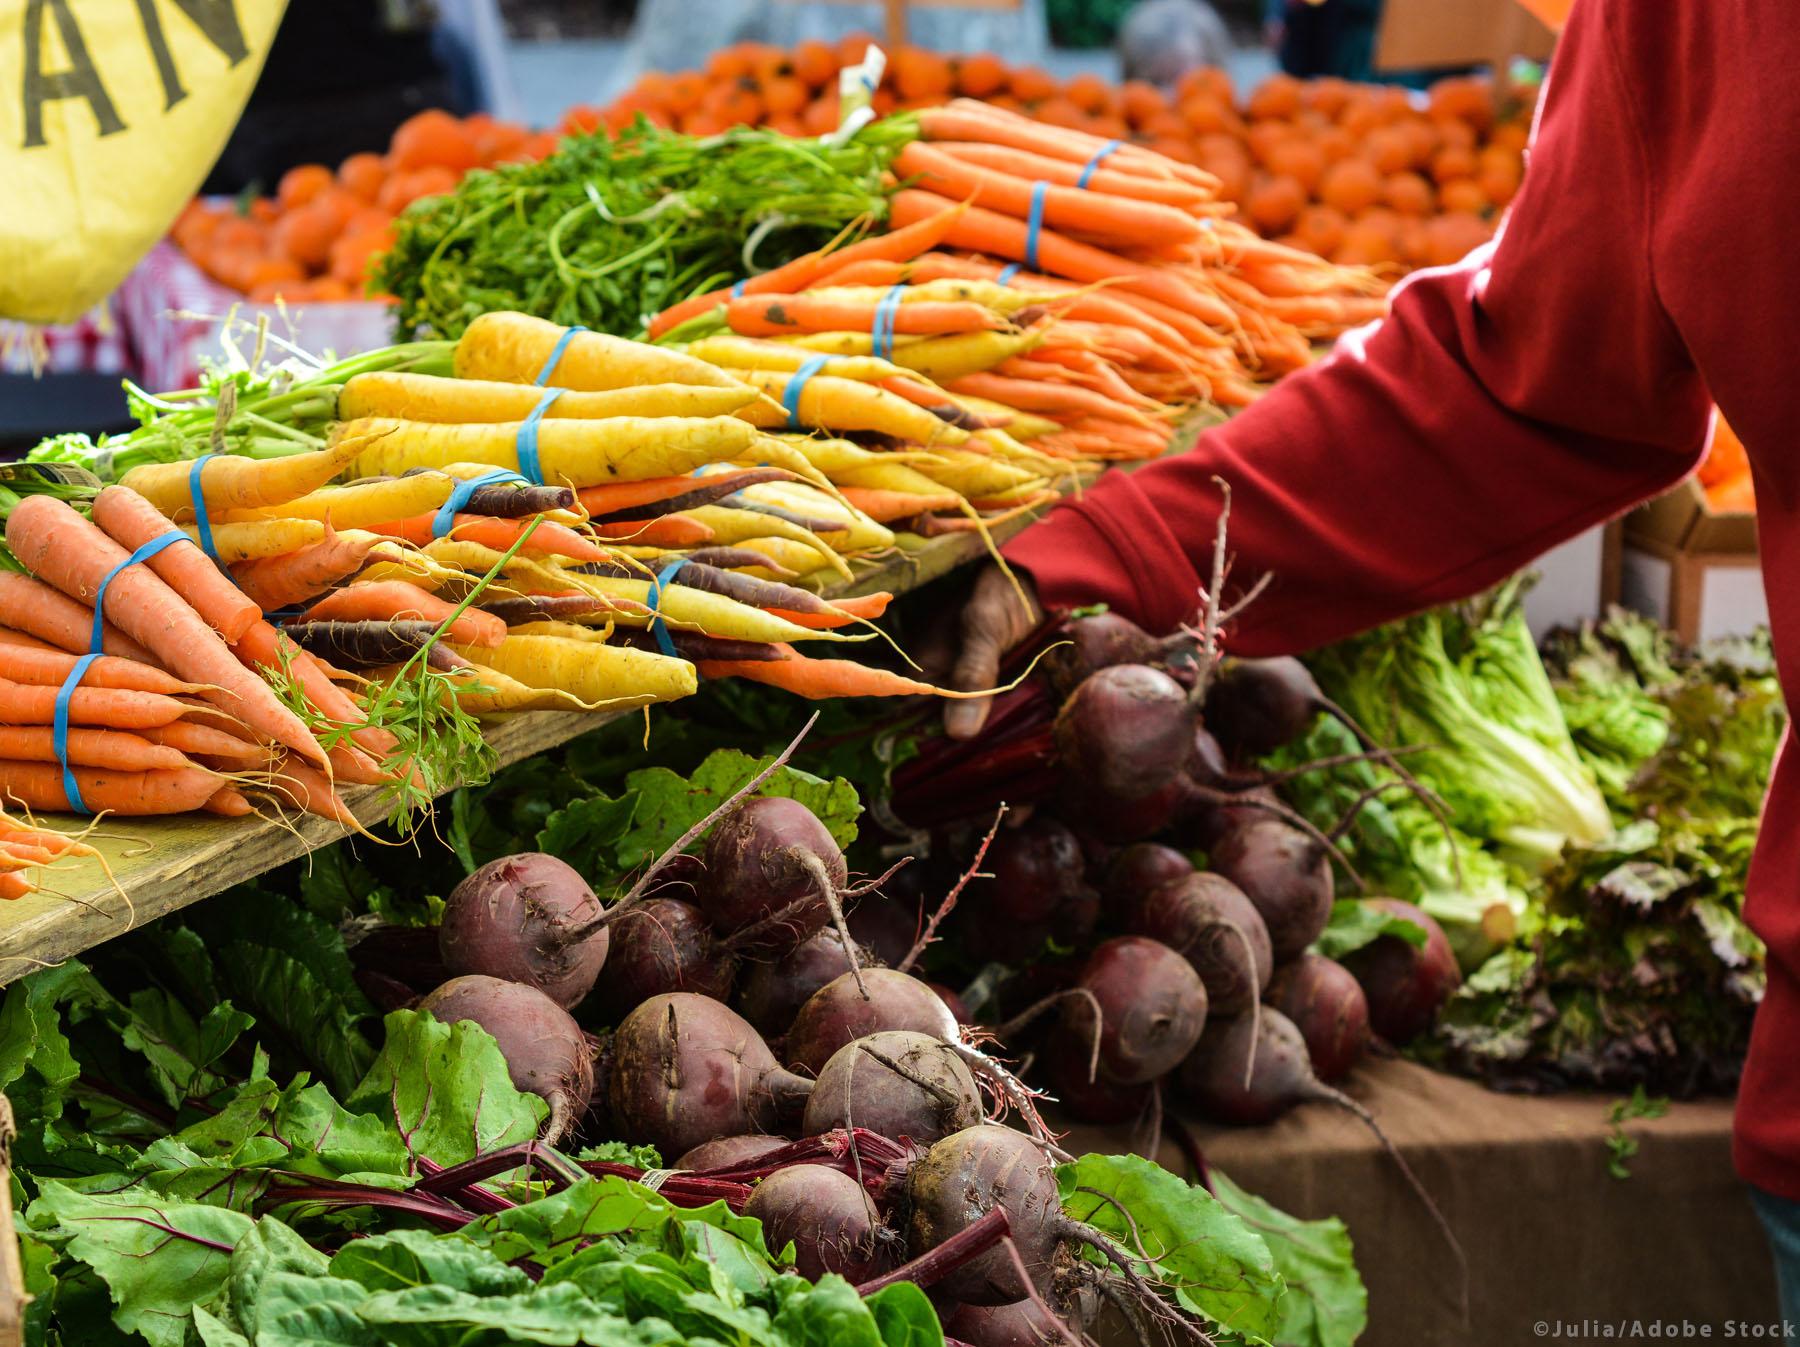 Sacramento Farmers Market